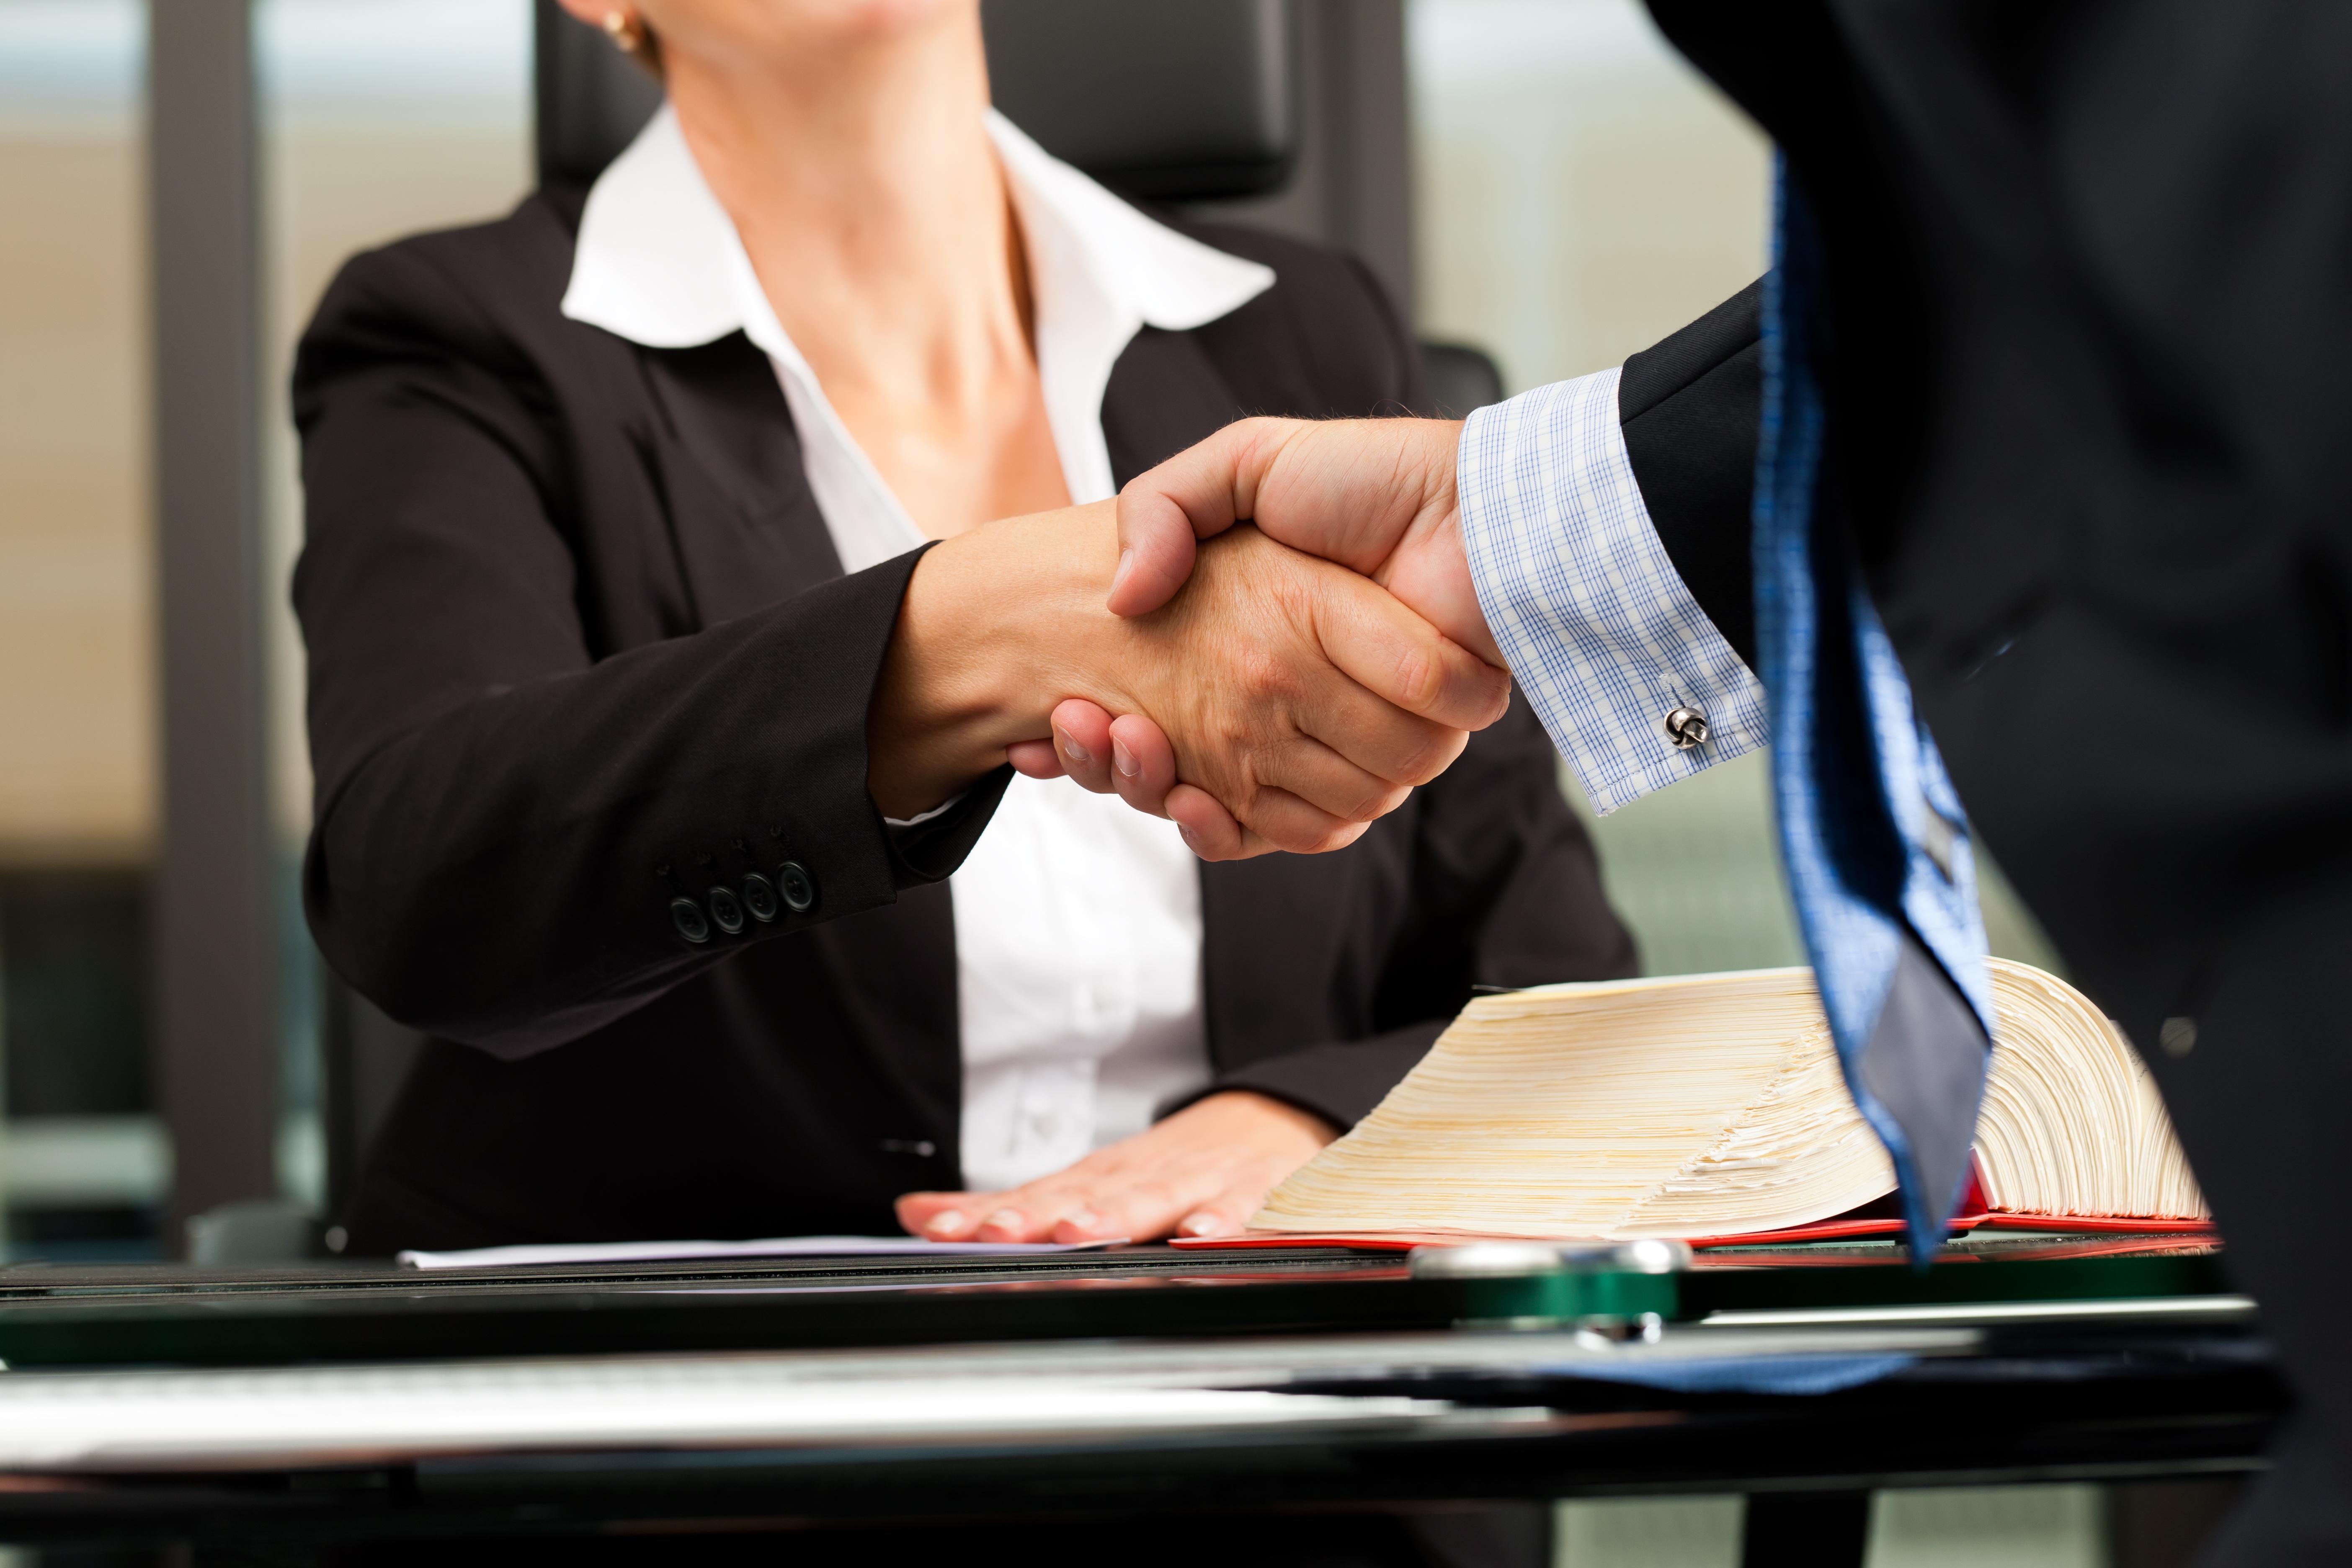 Firma Legal de Abogados en Español de Acuerdos en Casos de Compensación Laboral, Mayor Compensación de Pago Adelantado en Chicago